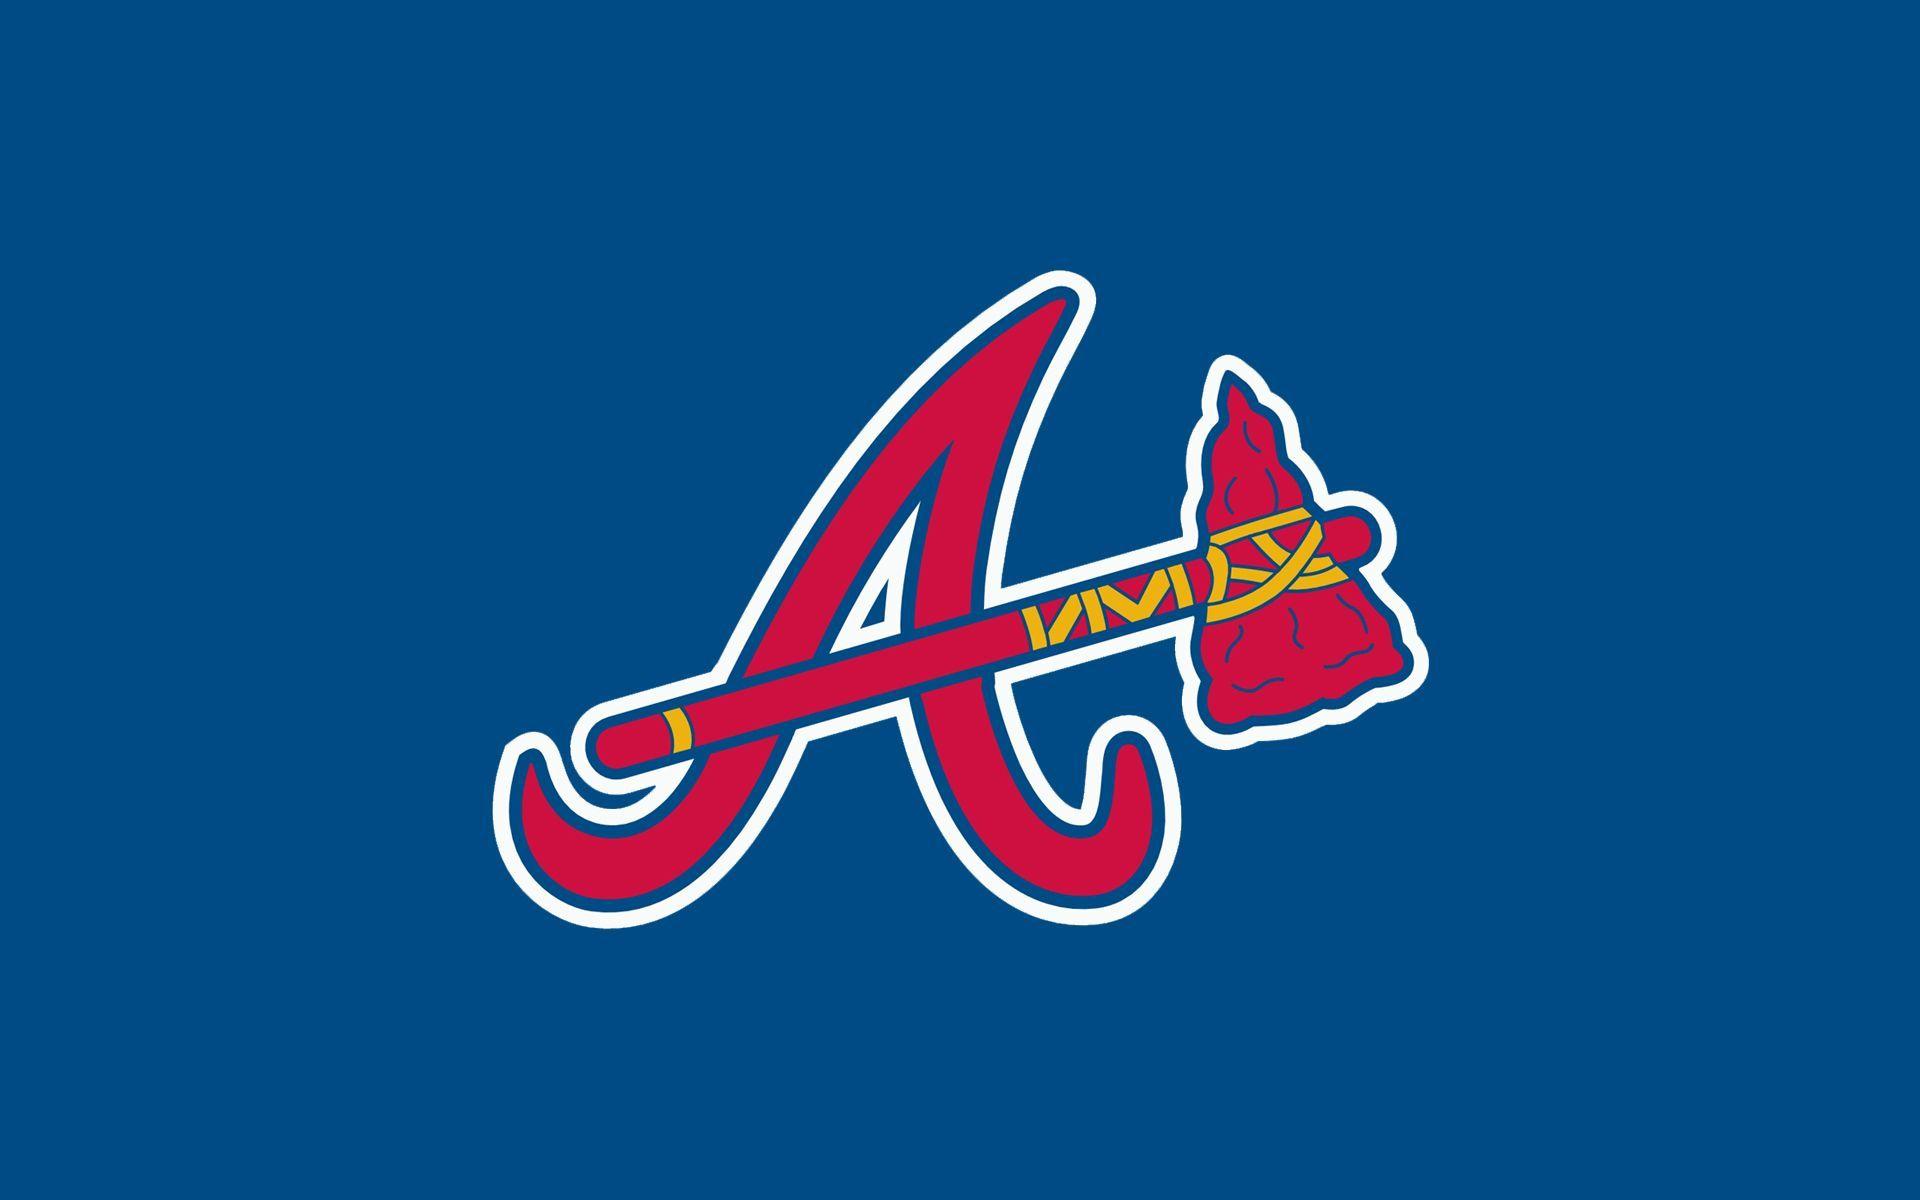 Atlanta Braves Wallpapers Top Free Atlanta Braves Backgrounds Wallpaperaccess